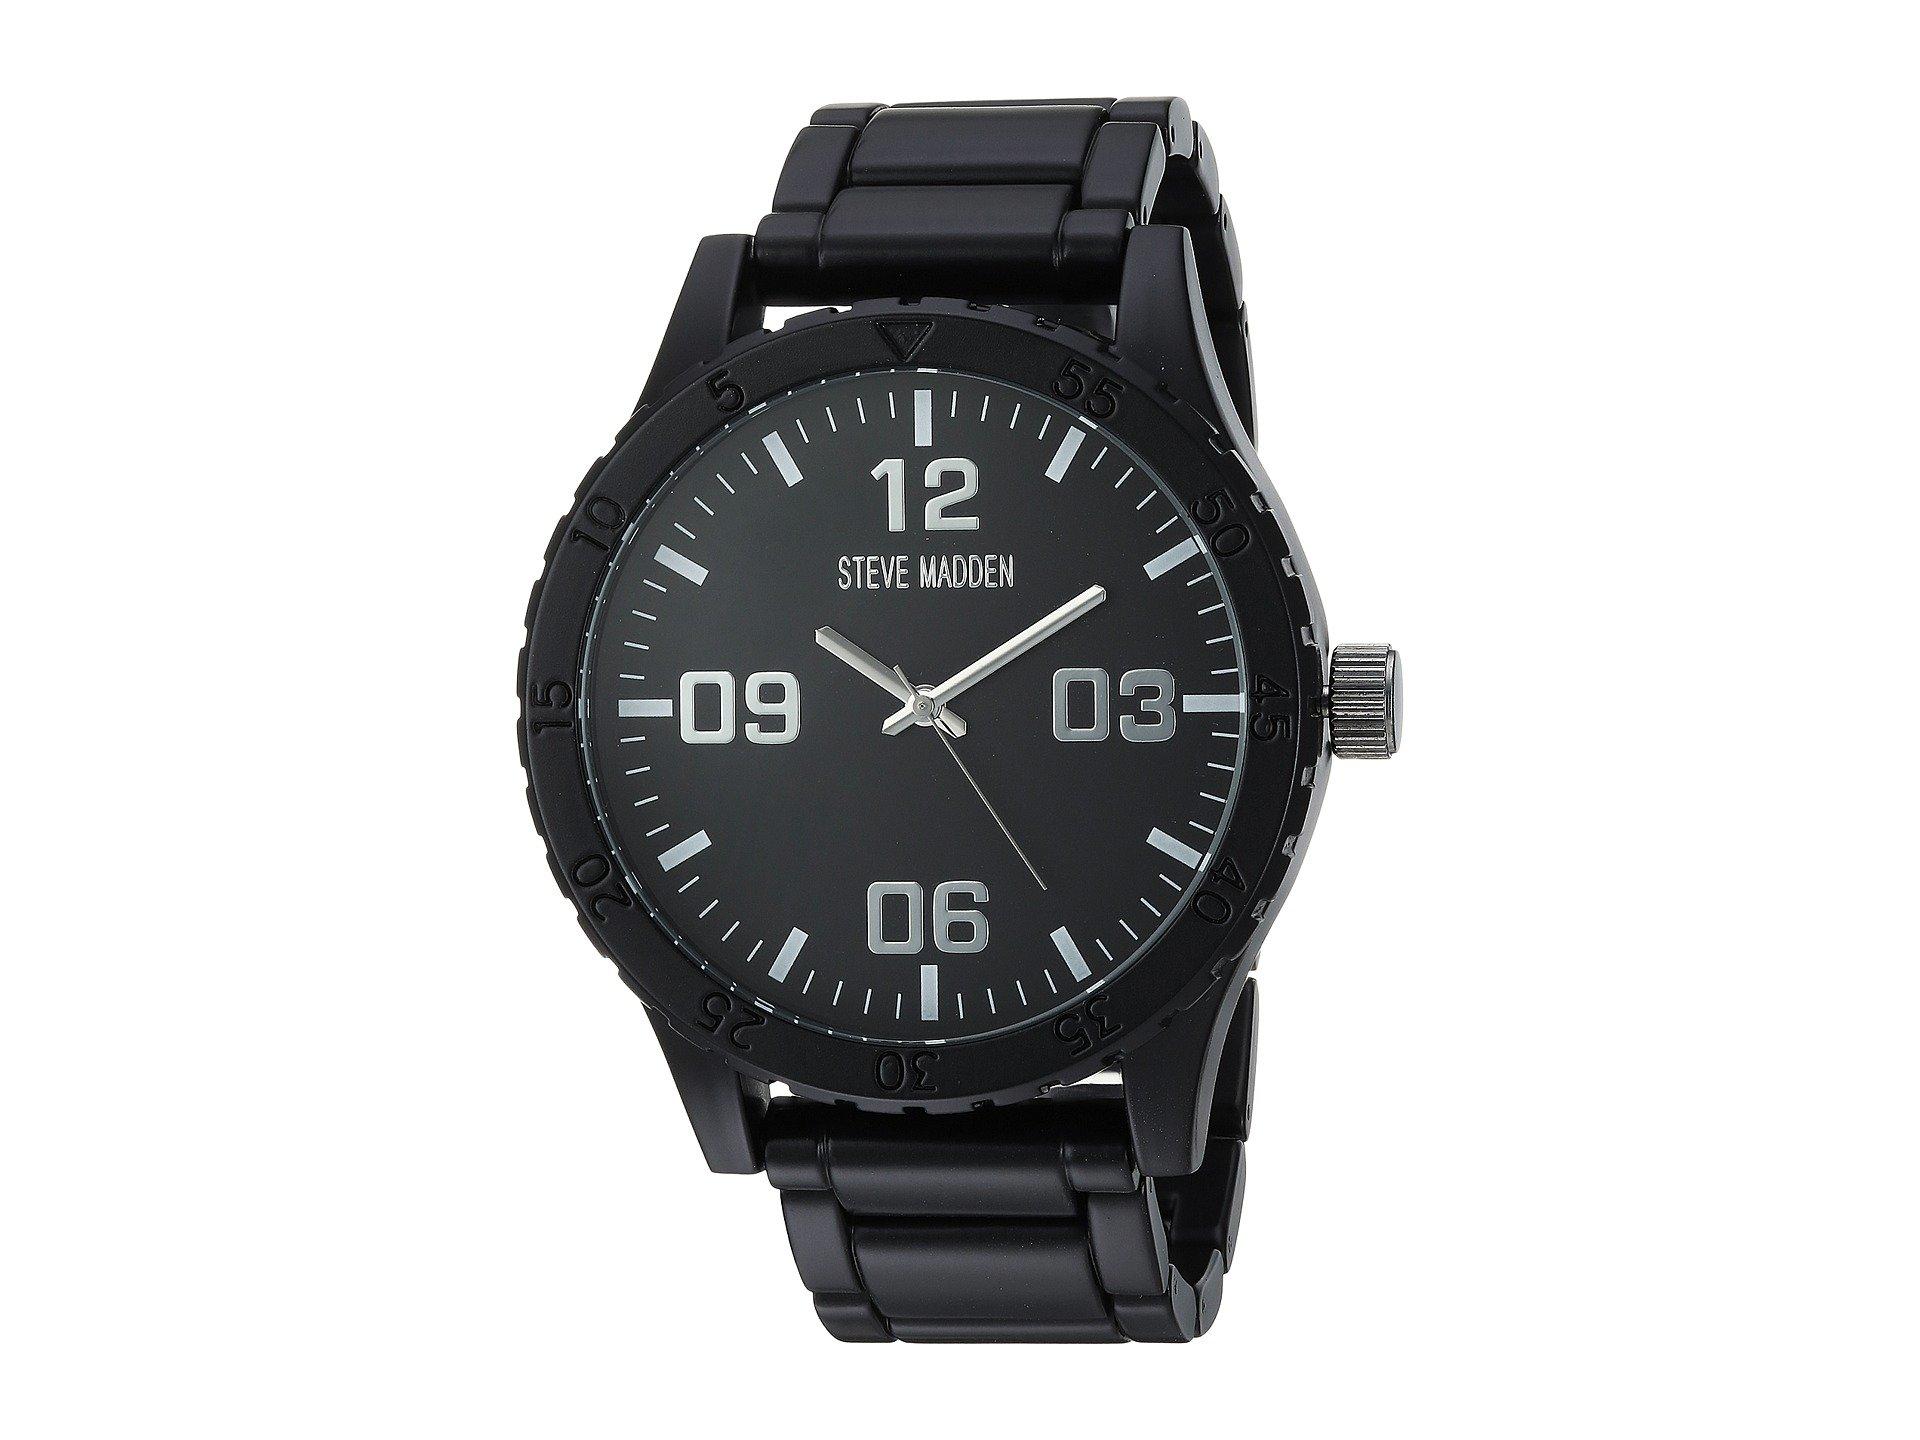 Reloj para Hombre Steve Madden SMW155  + Steve Madden en VeoyCompro.net